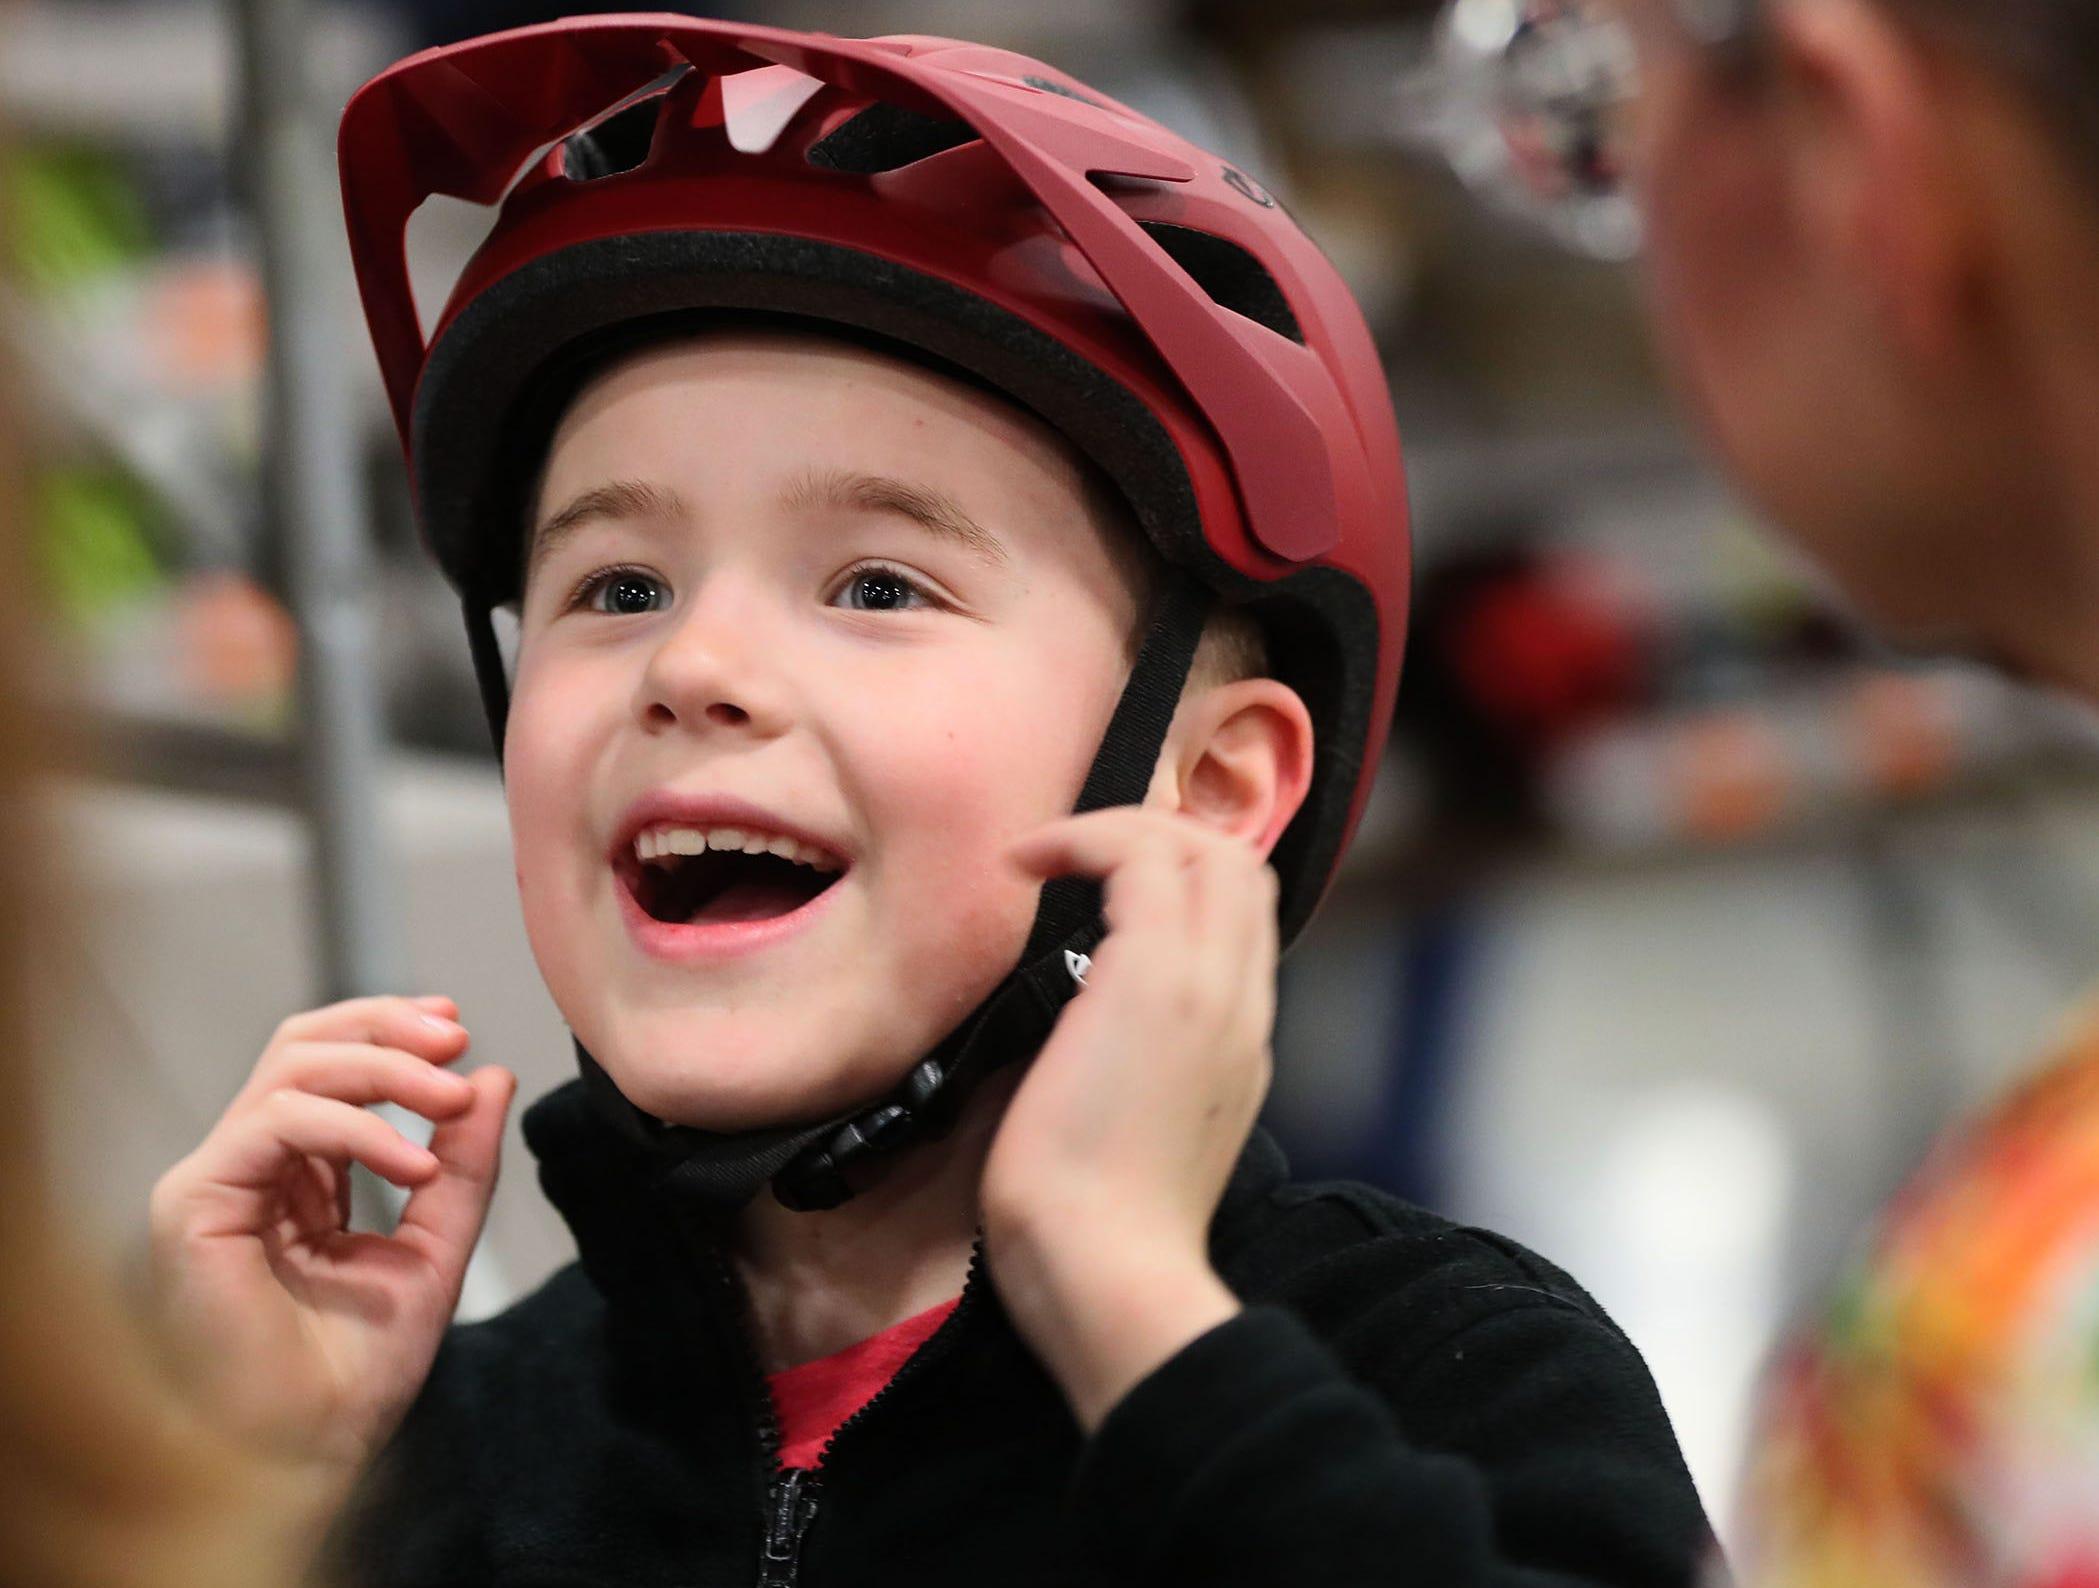 Will Weber, 8, of Wauwatosa tries on a new bike helmet.